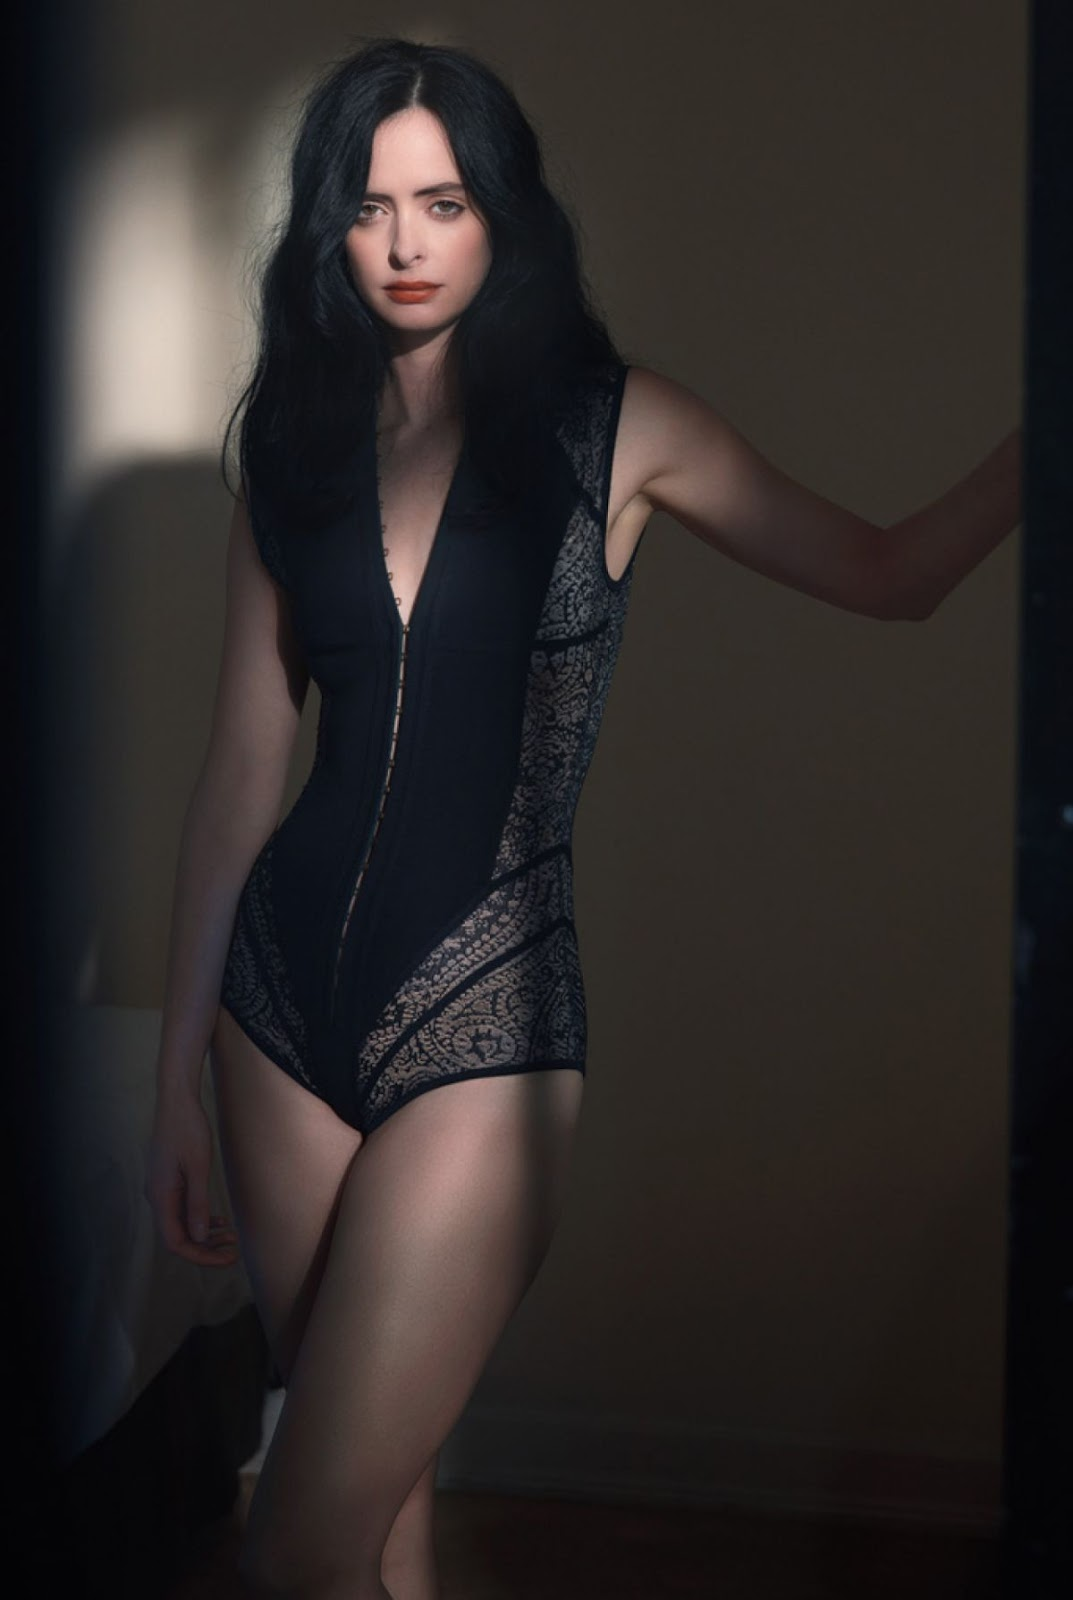 arts cross stitch actress model krysten ritter   w